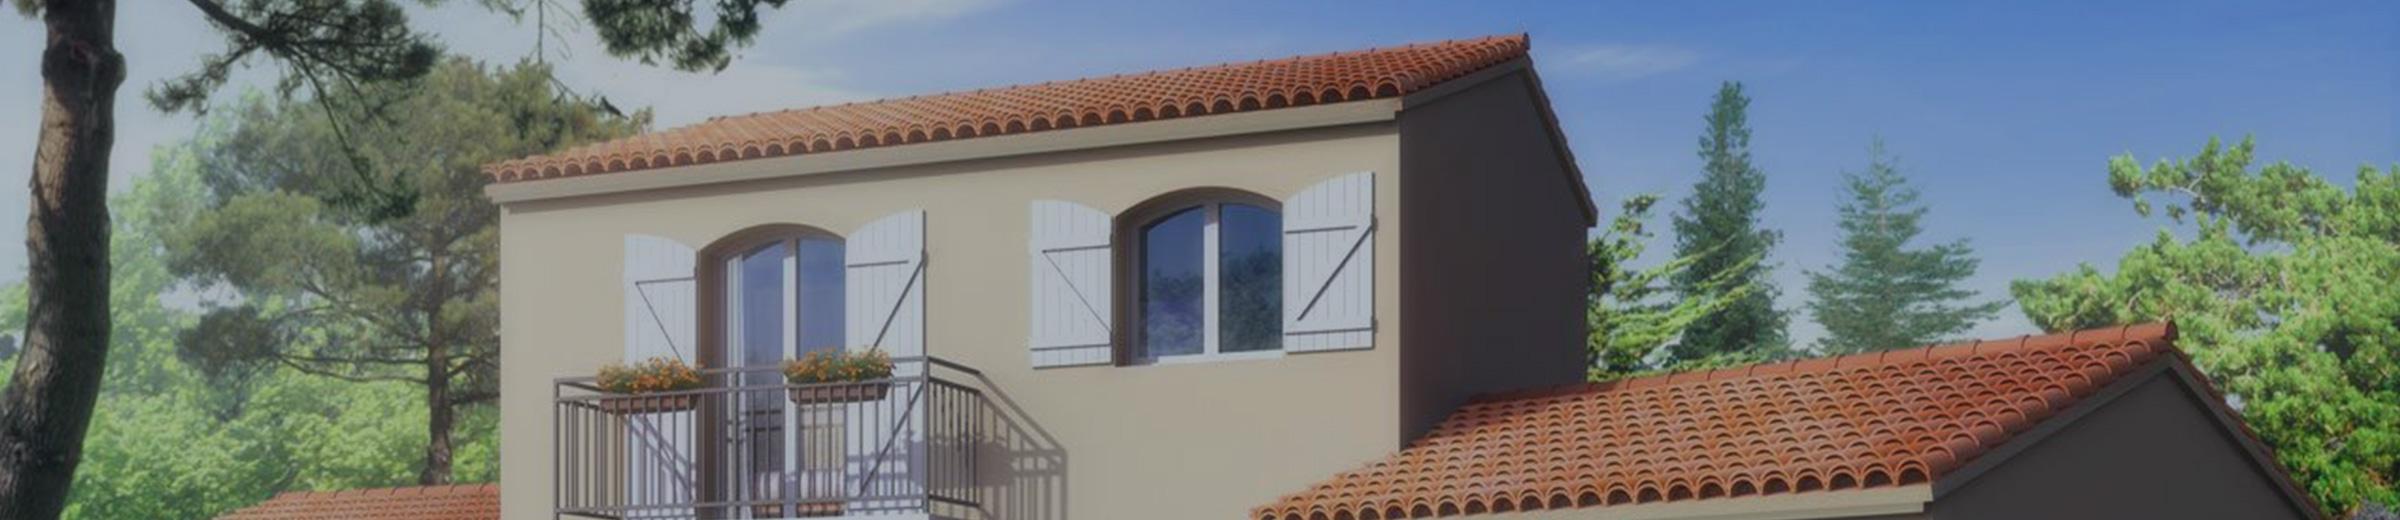 Lotissement valle di mezzana programme immobilier neuf for Maison neuve programme immobilier neuf